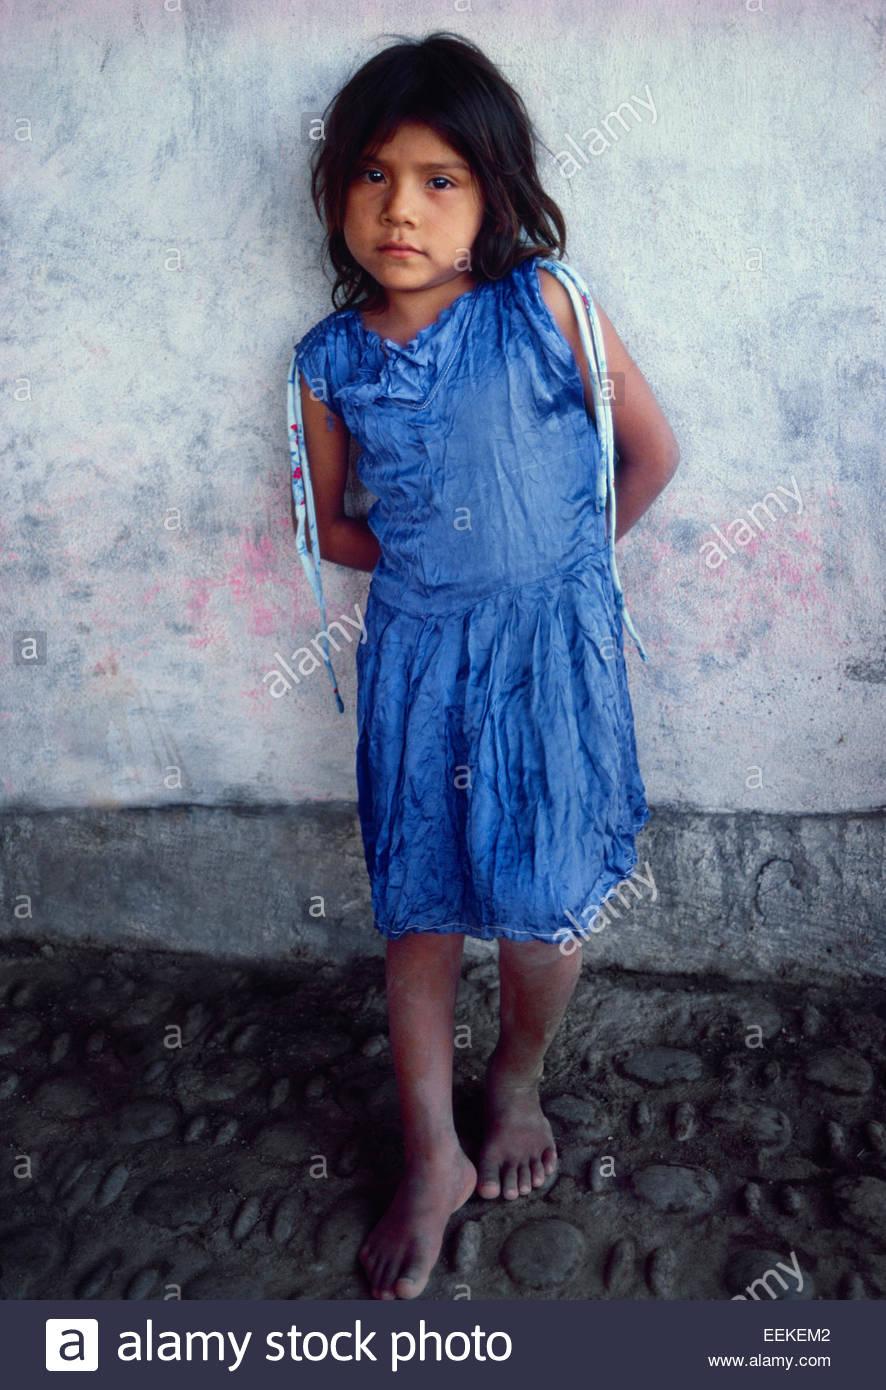 Nahua Indian girl. Maruata, Michoacan, Mexico. - Stock Image